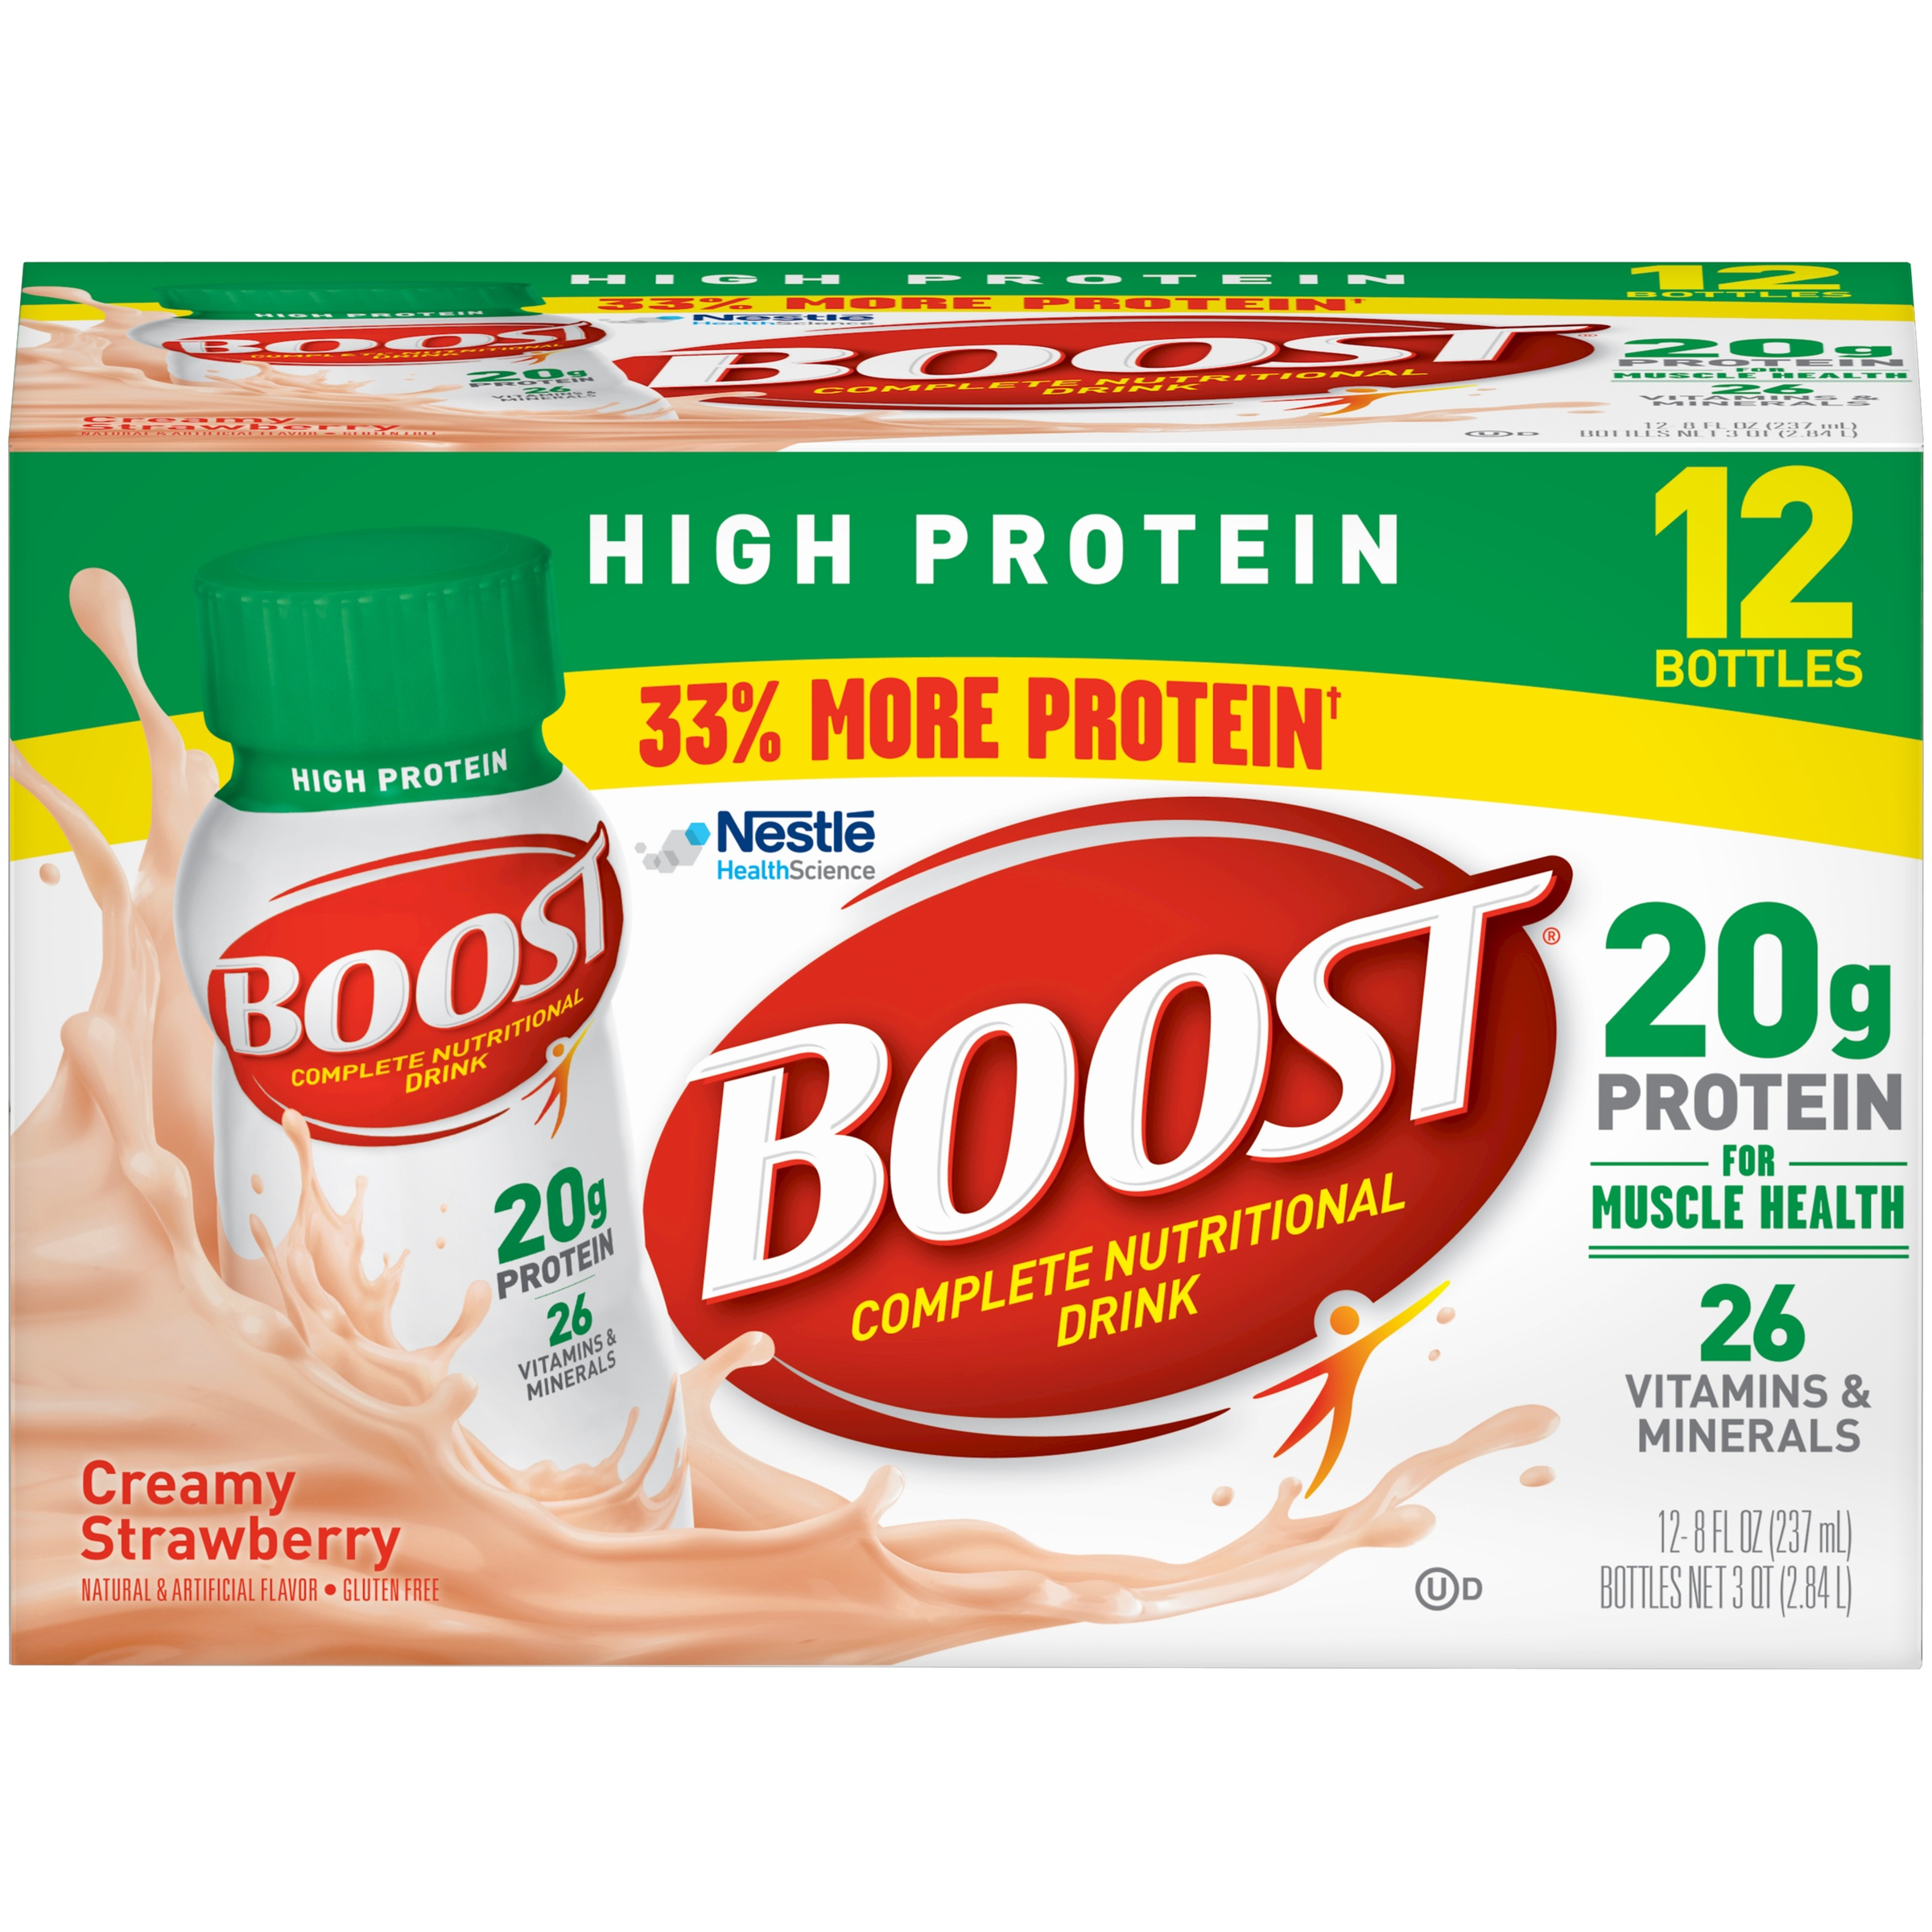 BOOST HIGH PROTEIN Strawberry Bliss 12-8 fl. oz. Bottles